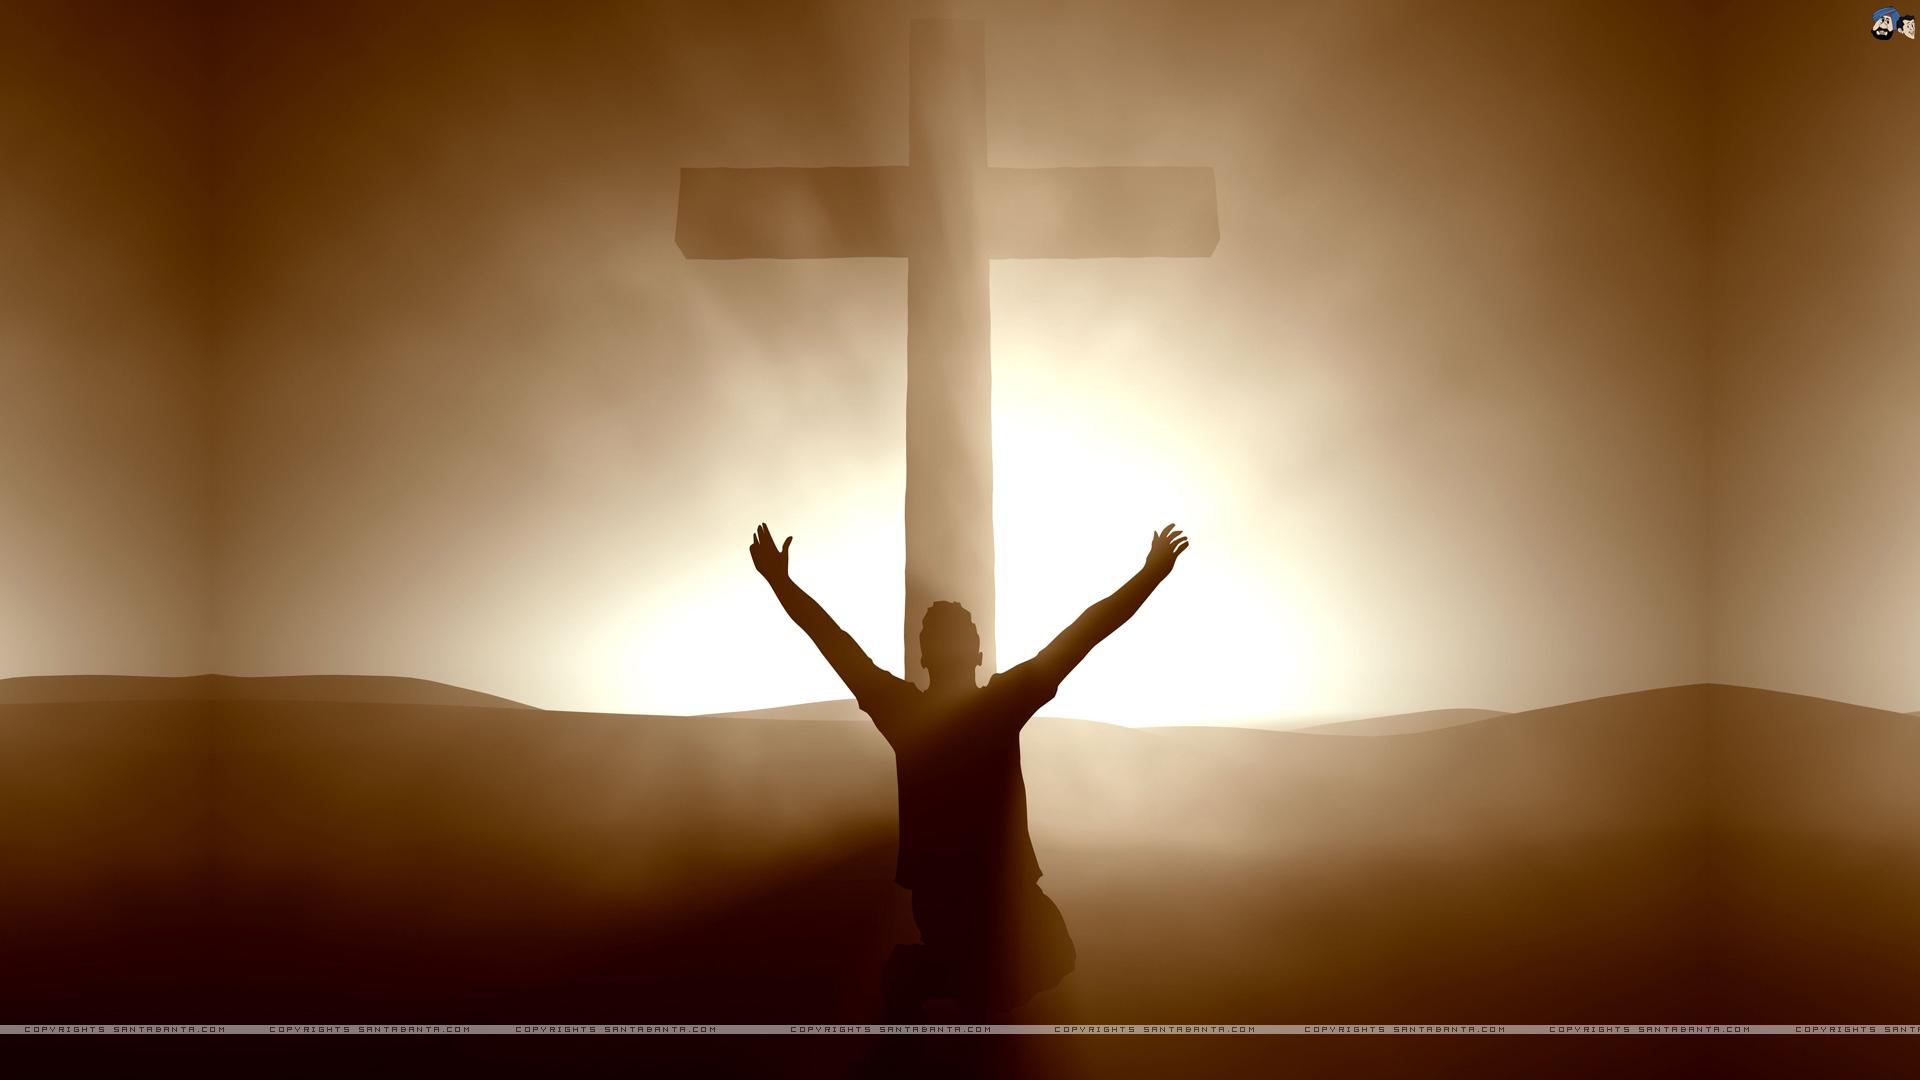 christian-symbols-11v1.jpg